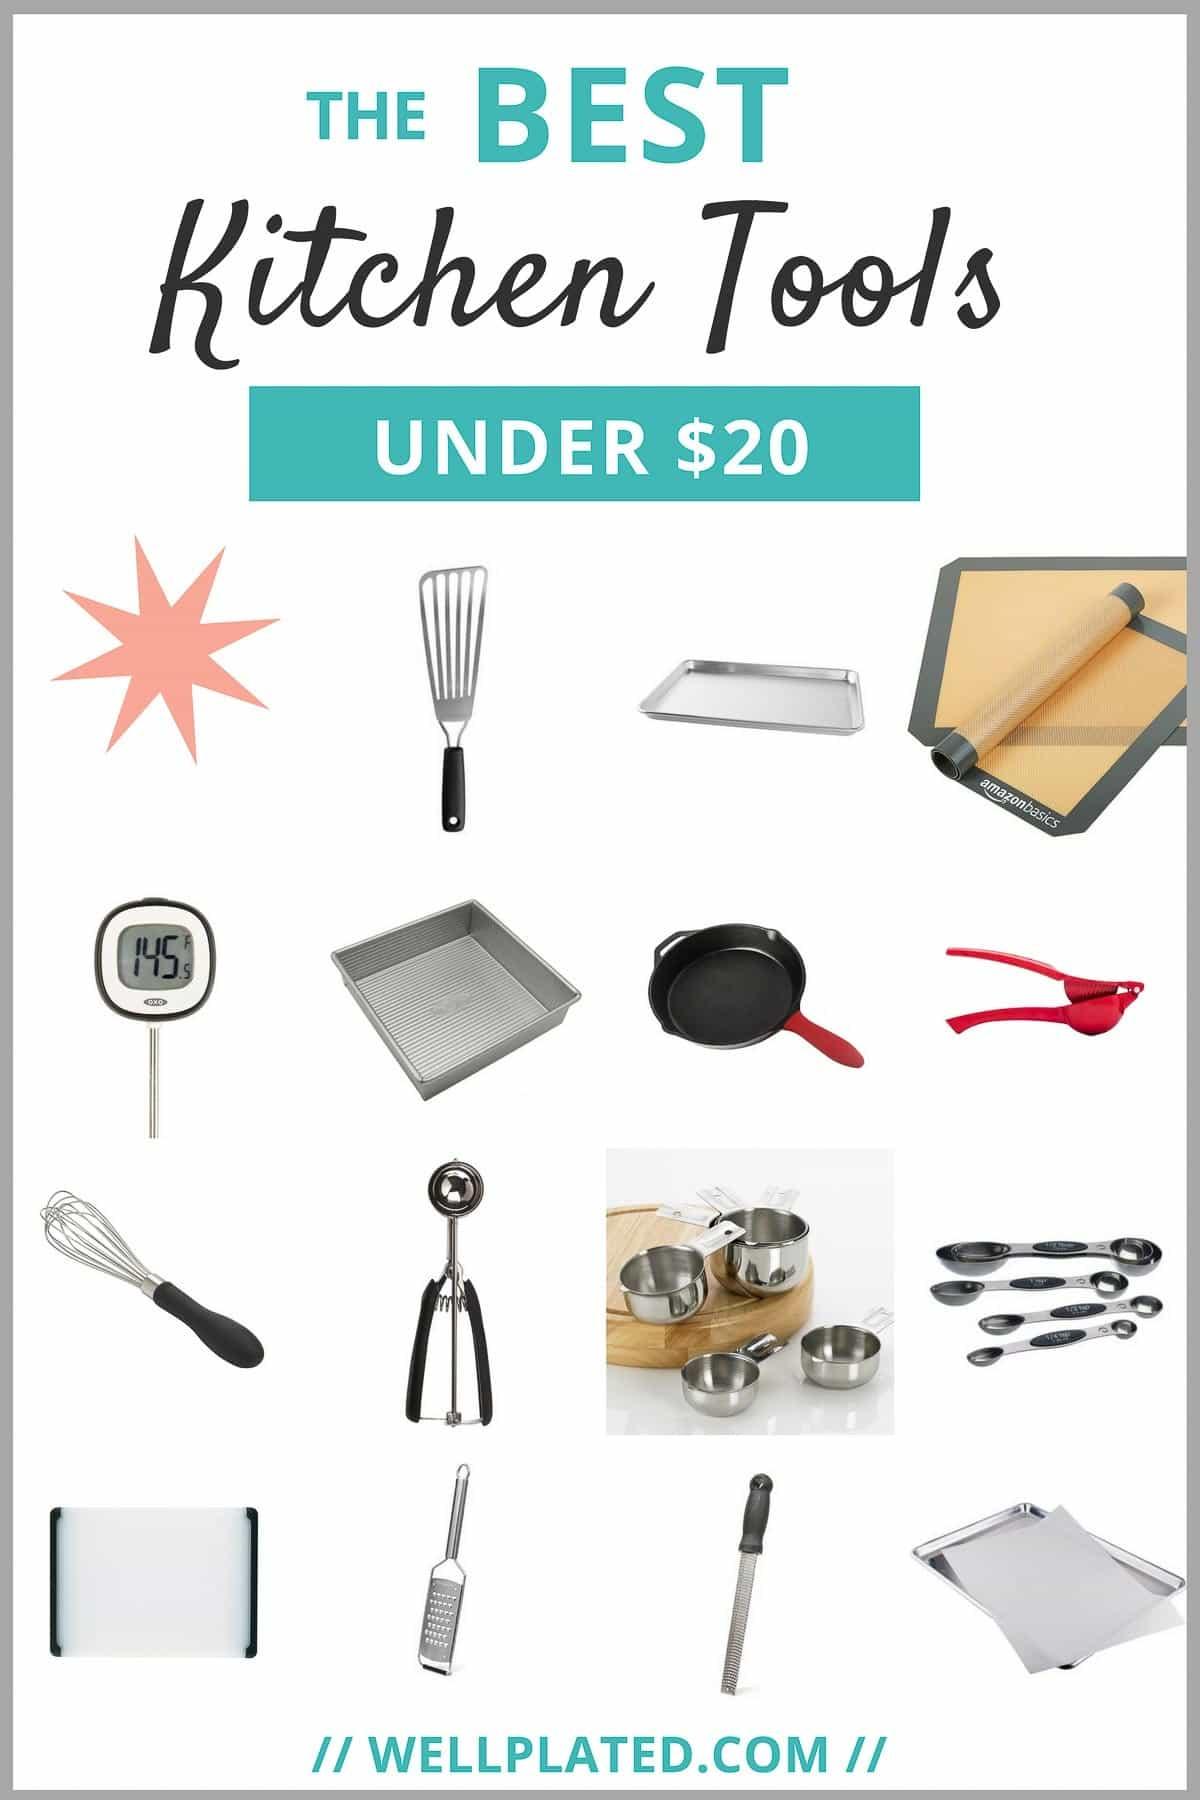 Cooking Utensils Worksheet